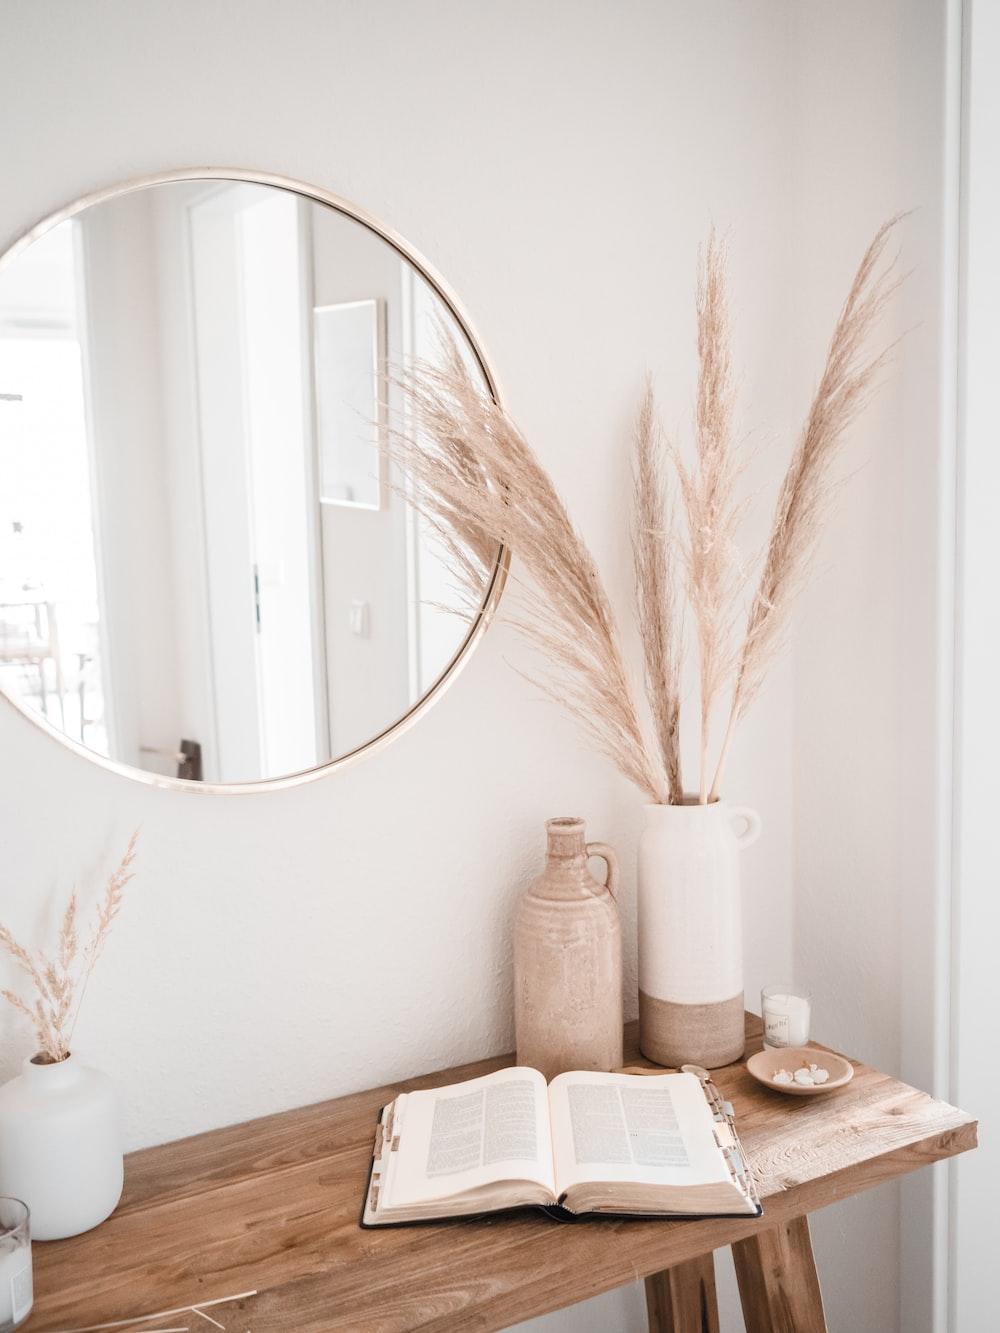 white ceramic sink with mirror